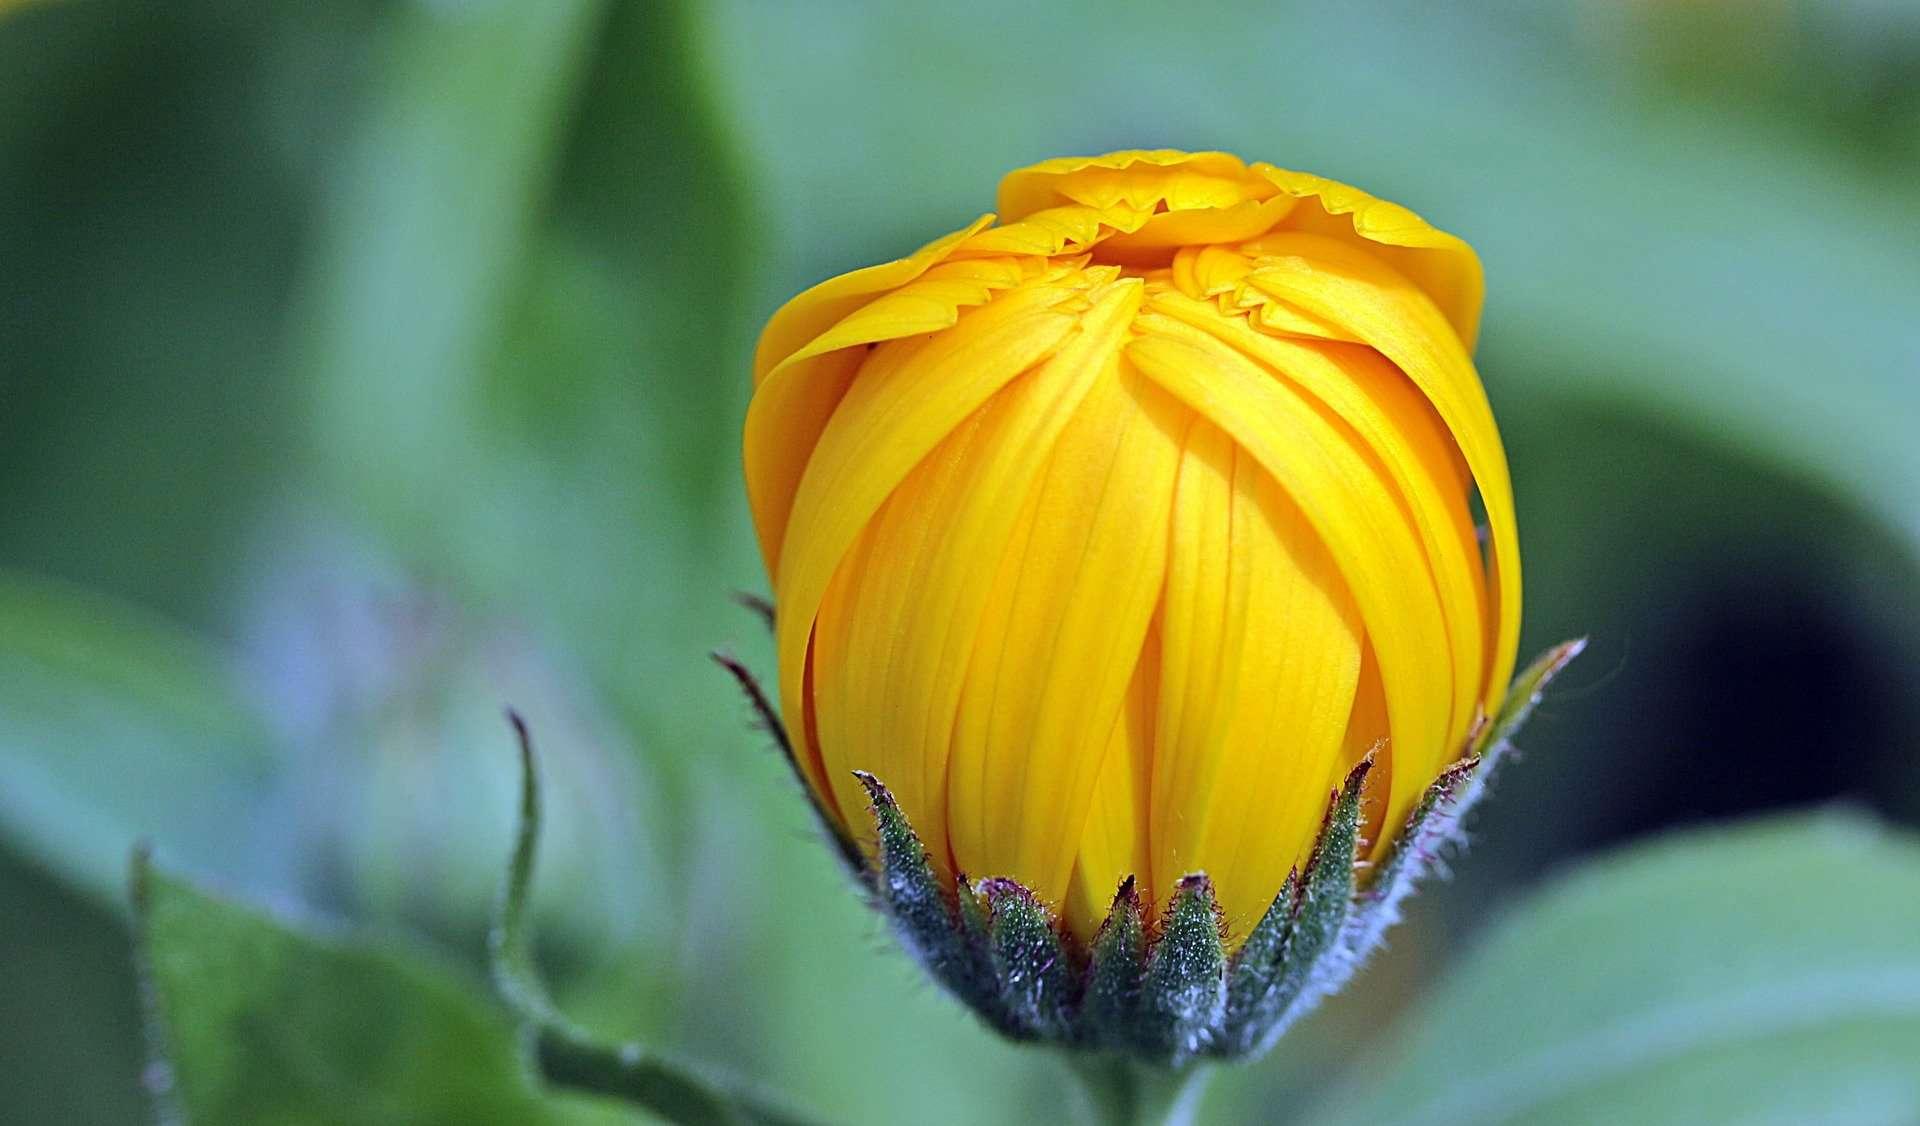 marigold-1503876_1920 Myriams-Fotos | Pixabay